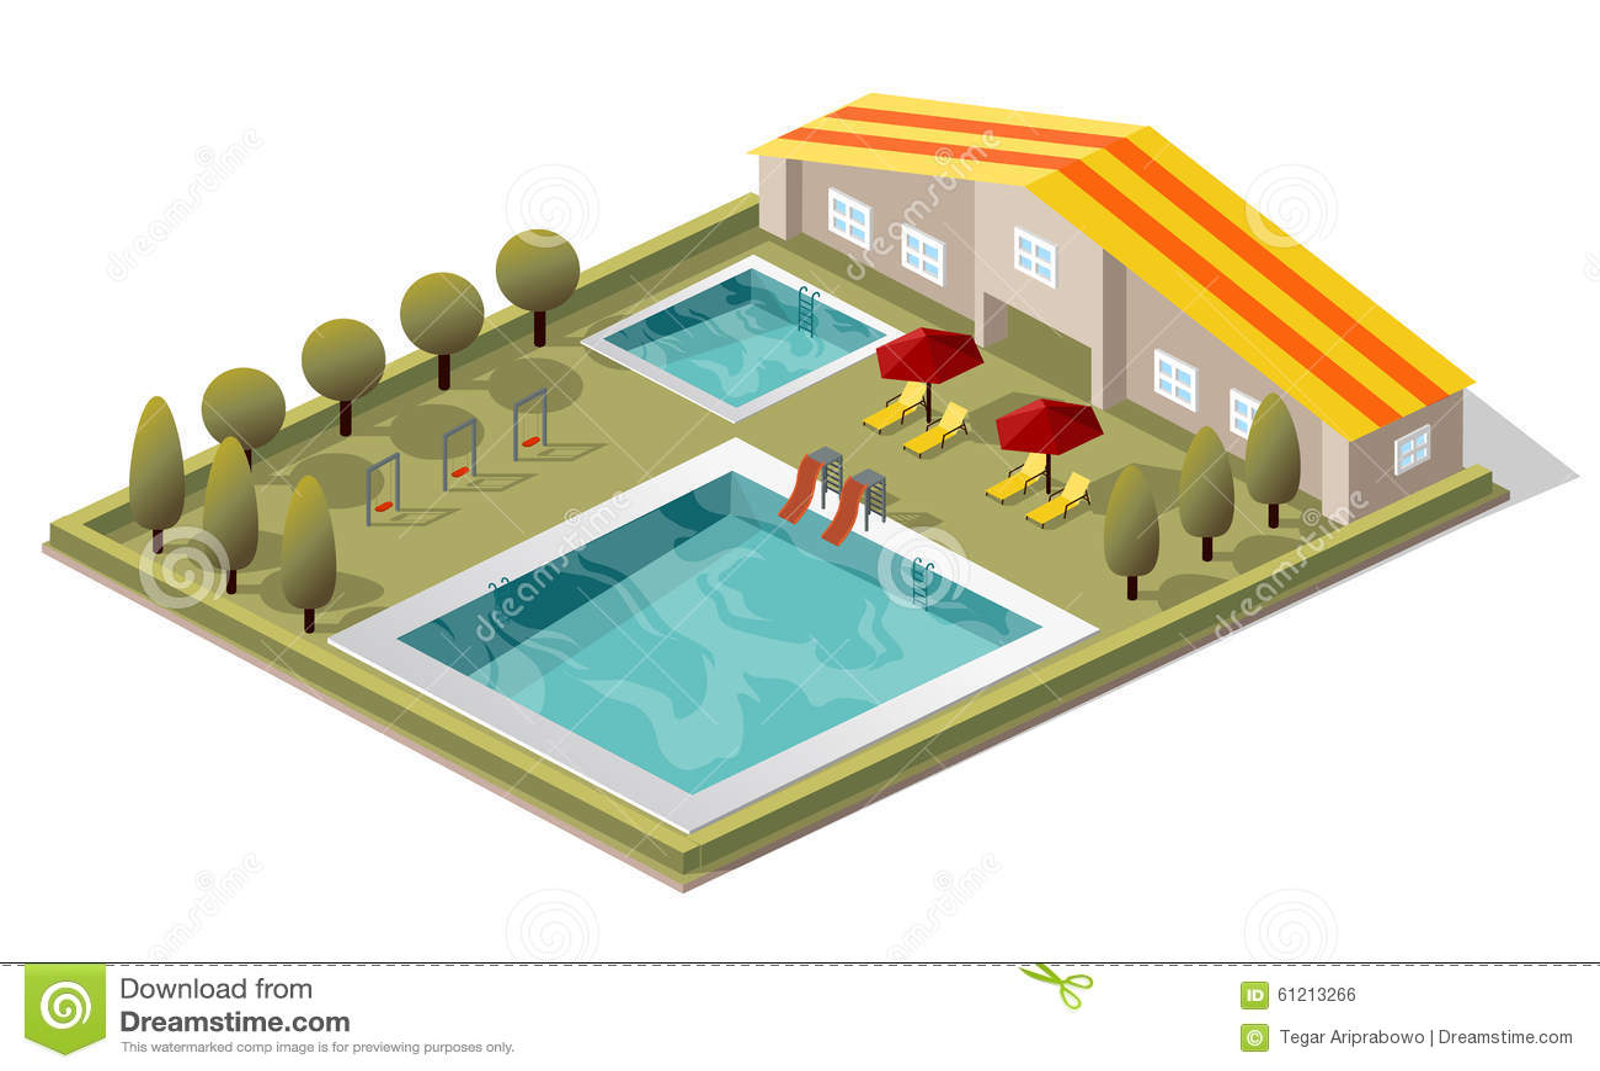 Inground Pool Schematics Isometric - DIY Wiring Diagrams •